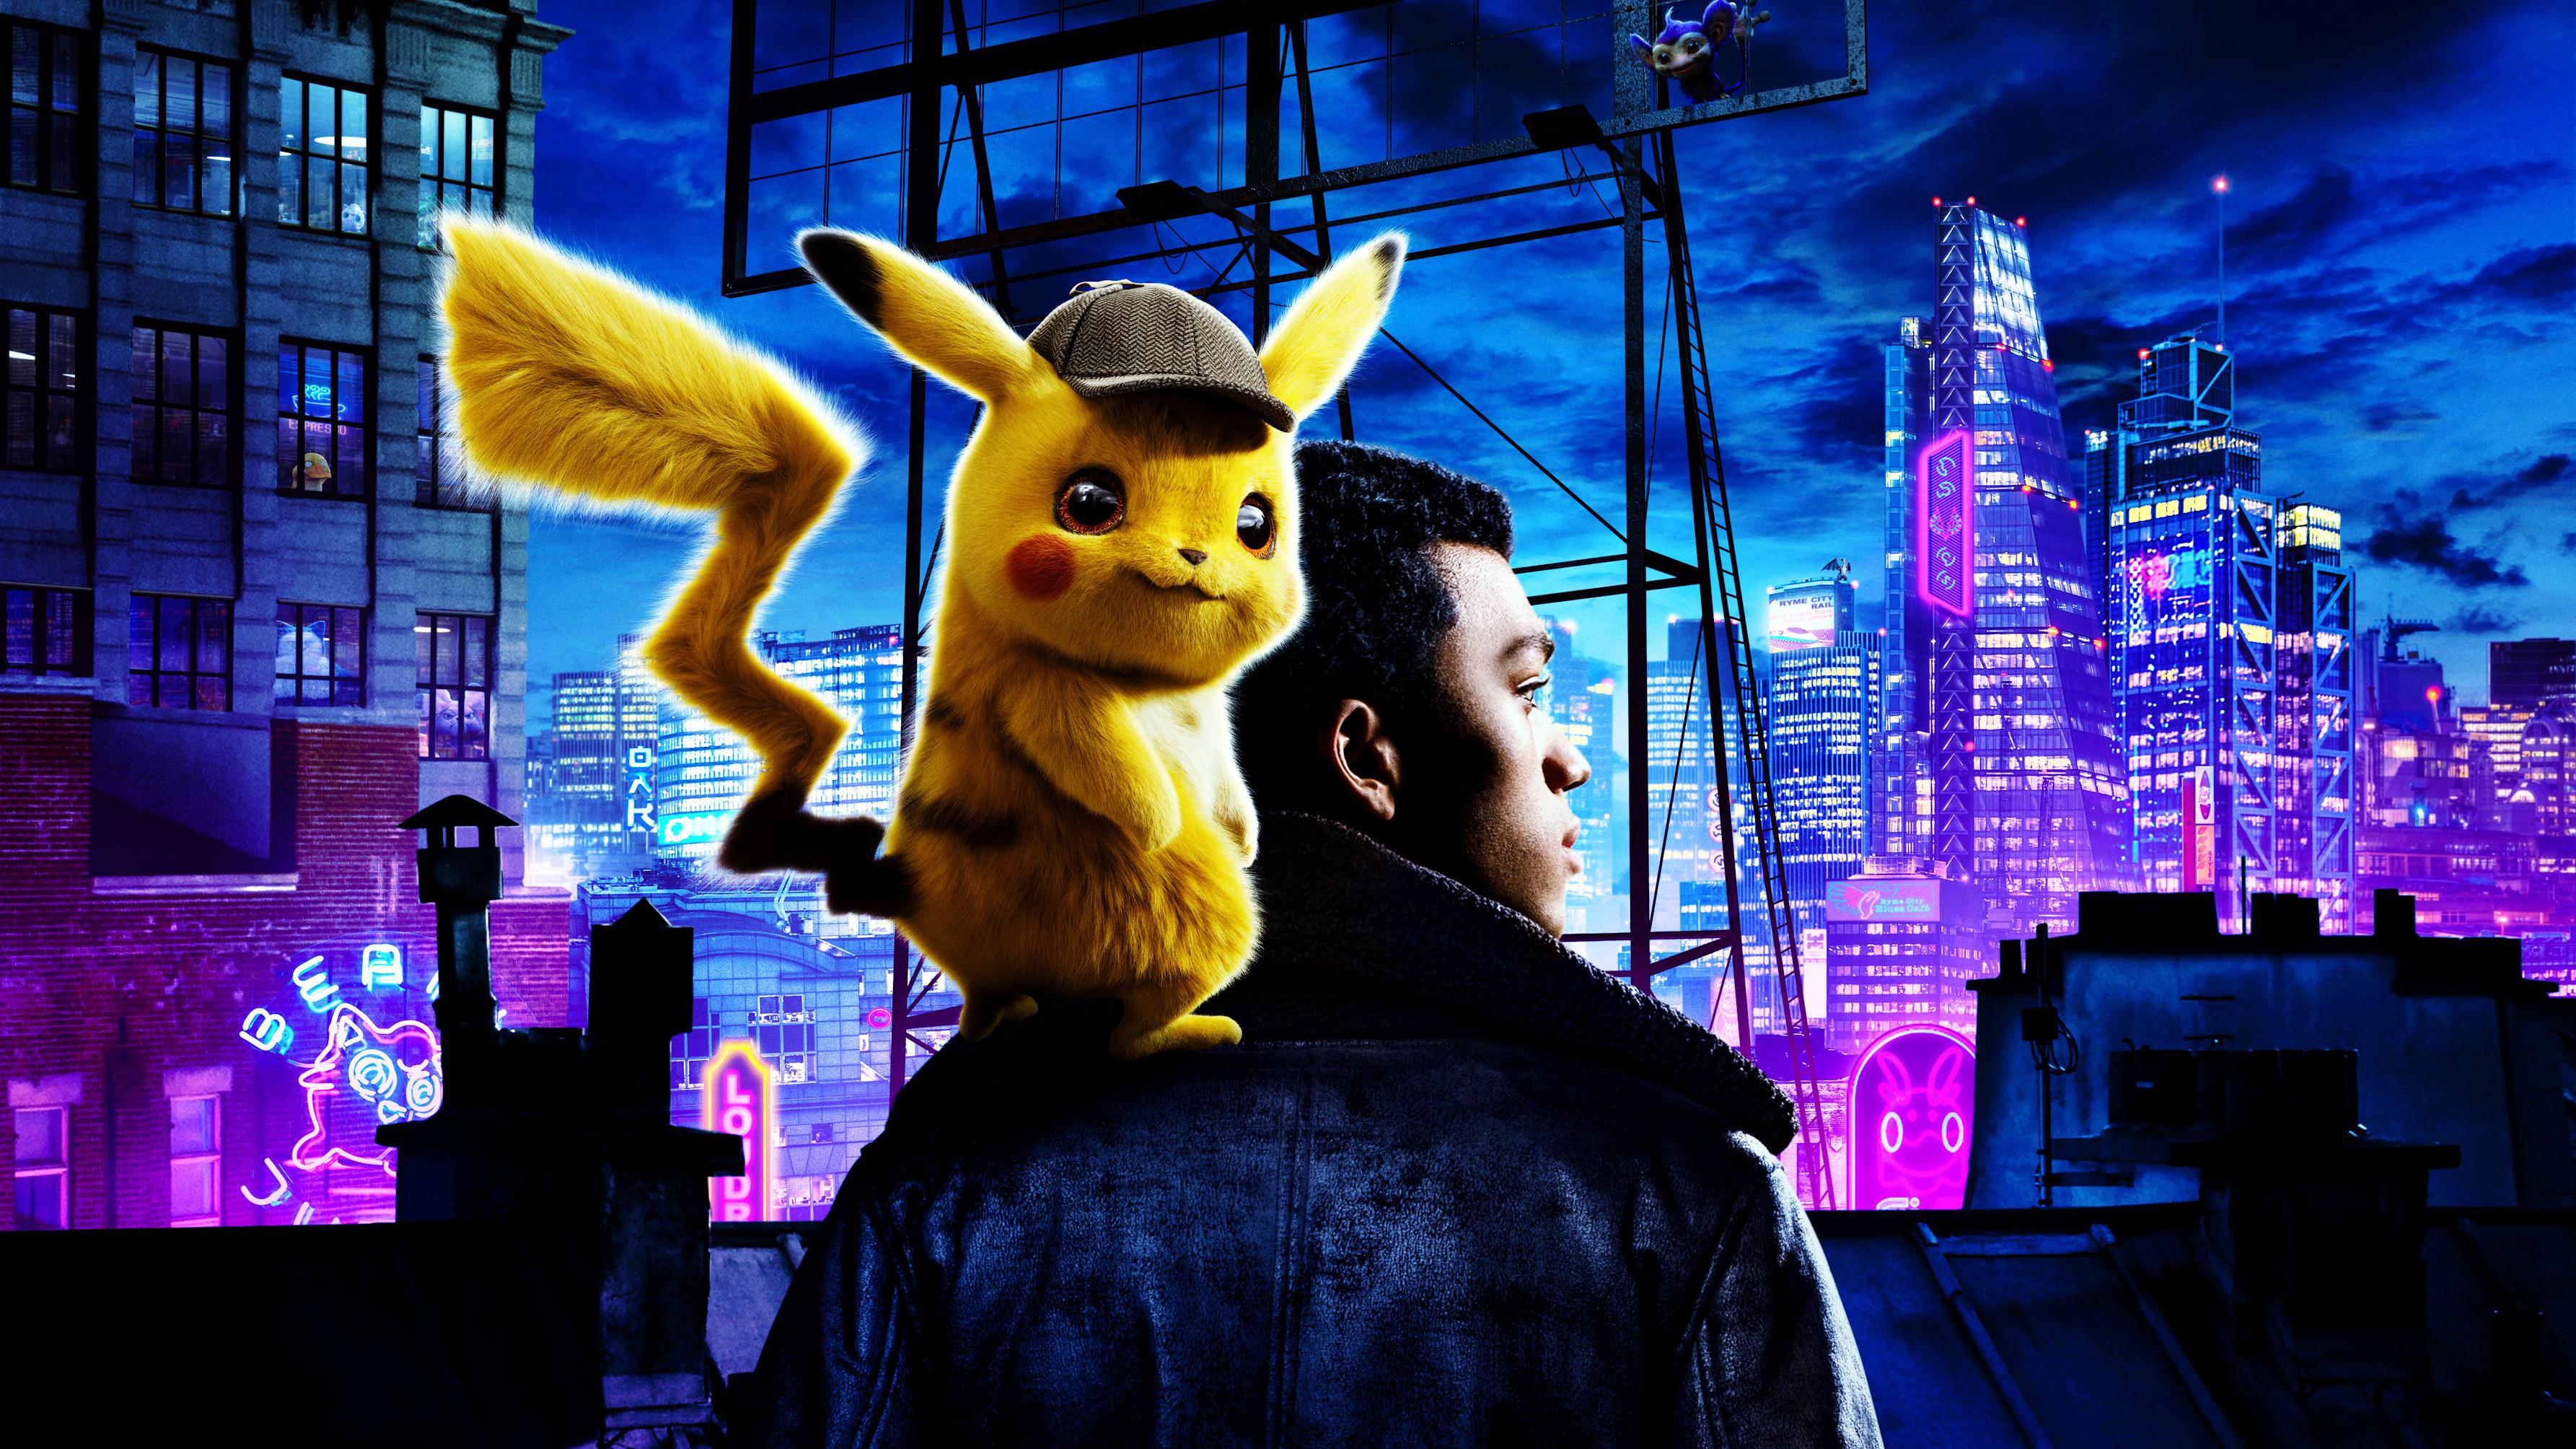 1366x768 Pokemon Detective Pikachu Movie 4k 1366x768 Resolution HD 4k Wallpapers, Images ...